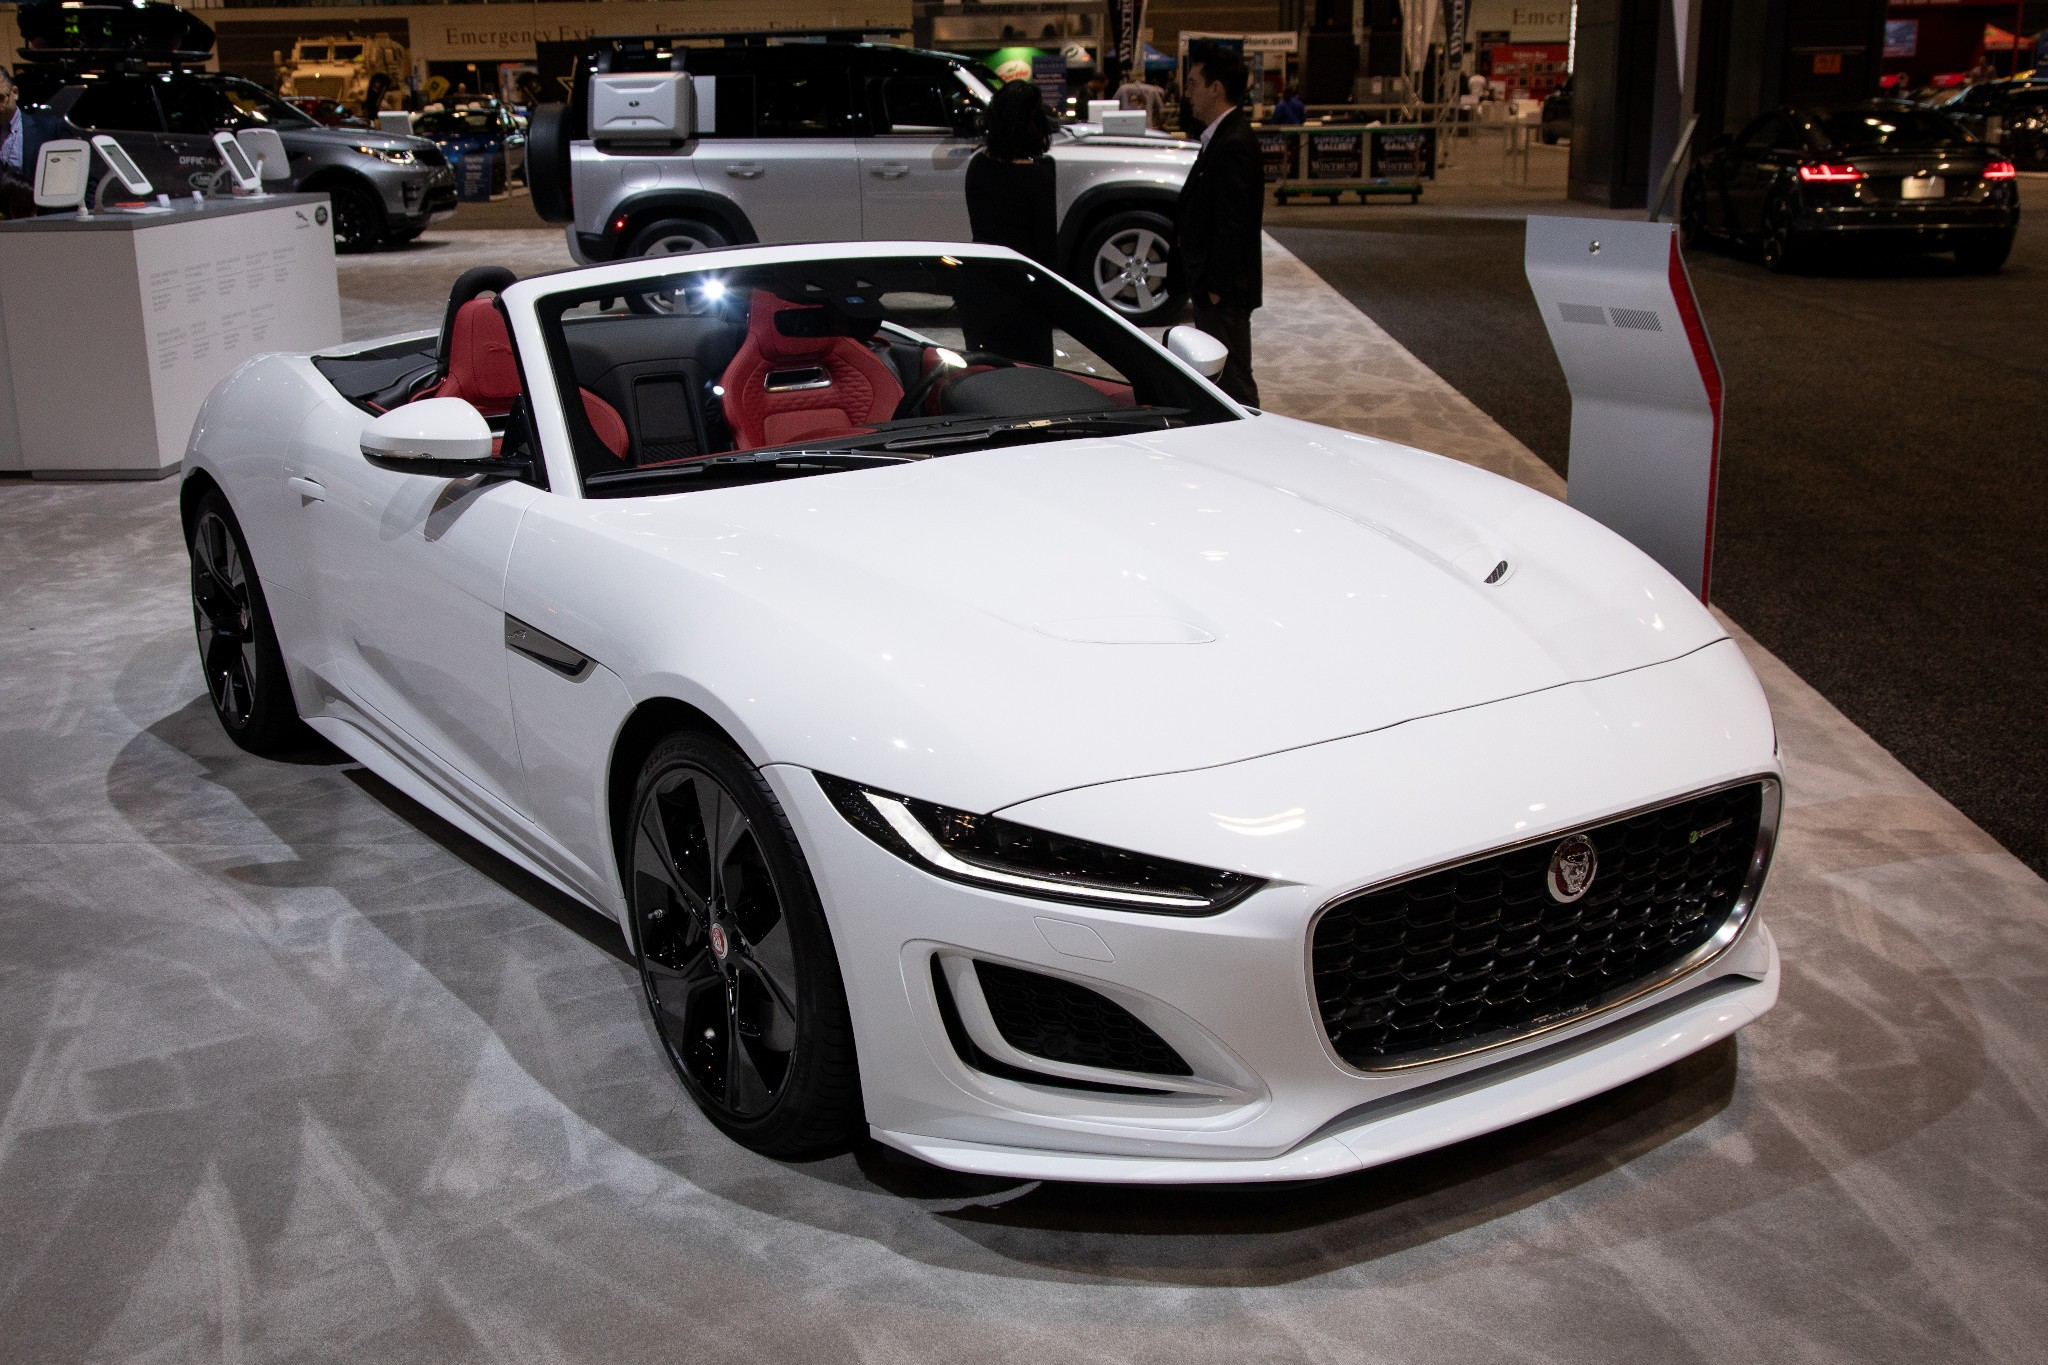 2021 F-Type Refresh Transforms Jaguar's Sports Car